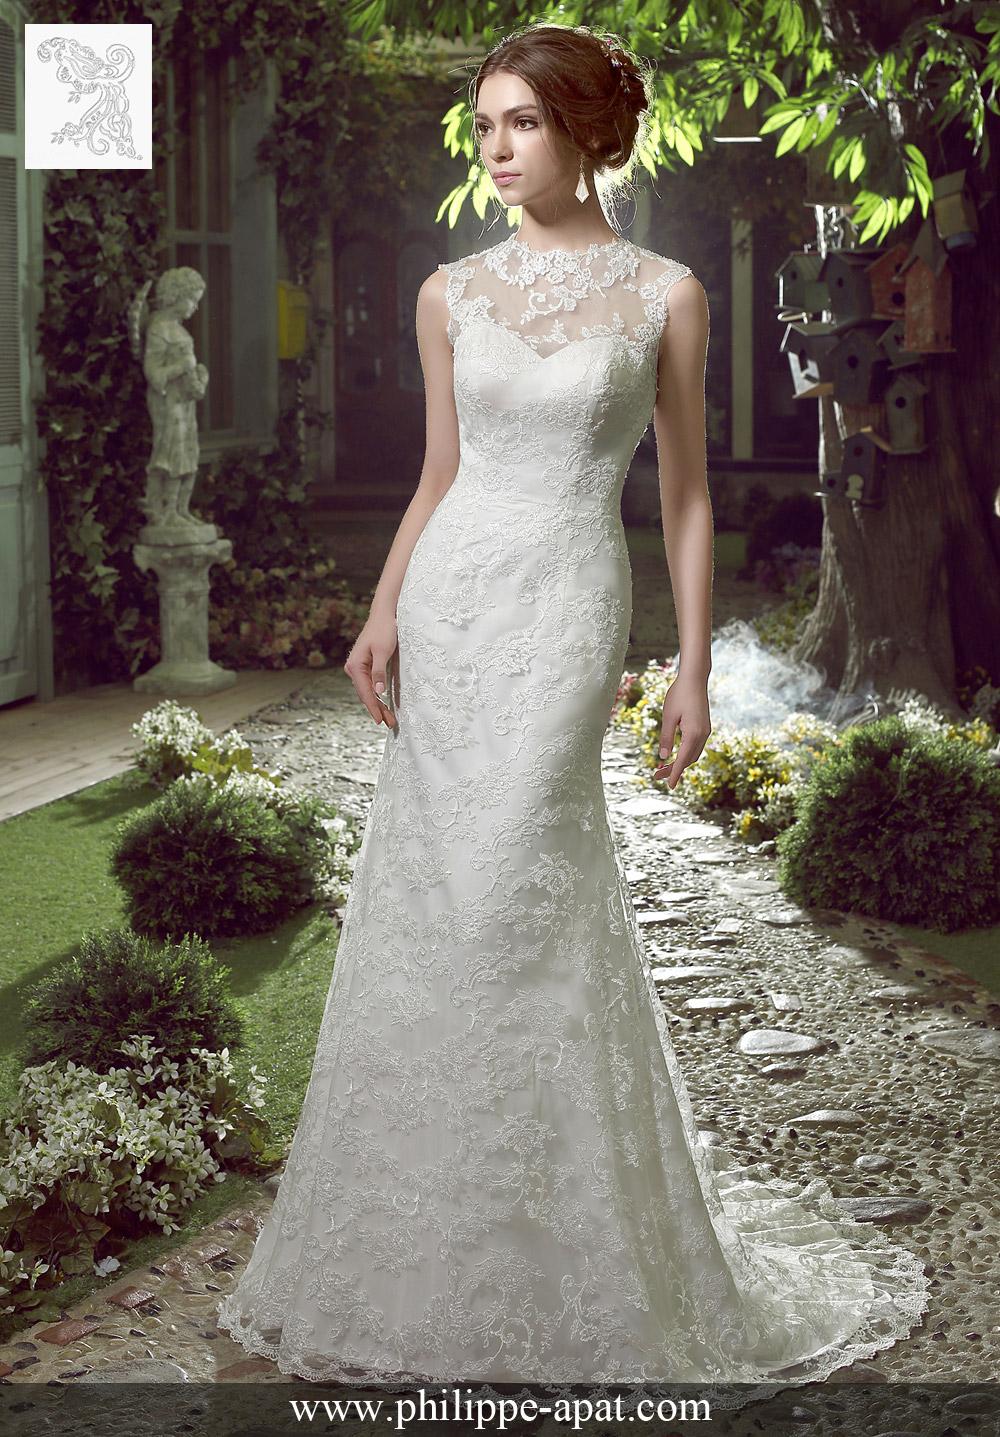 Robe de mariage blanche